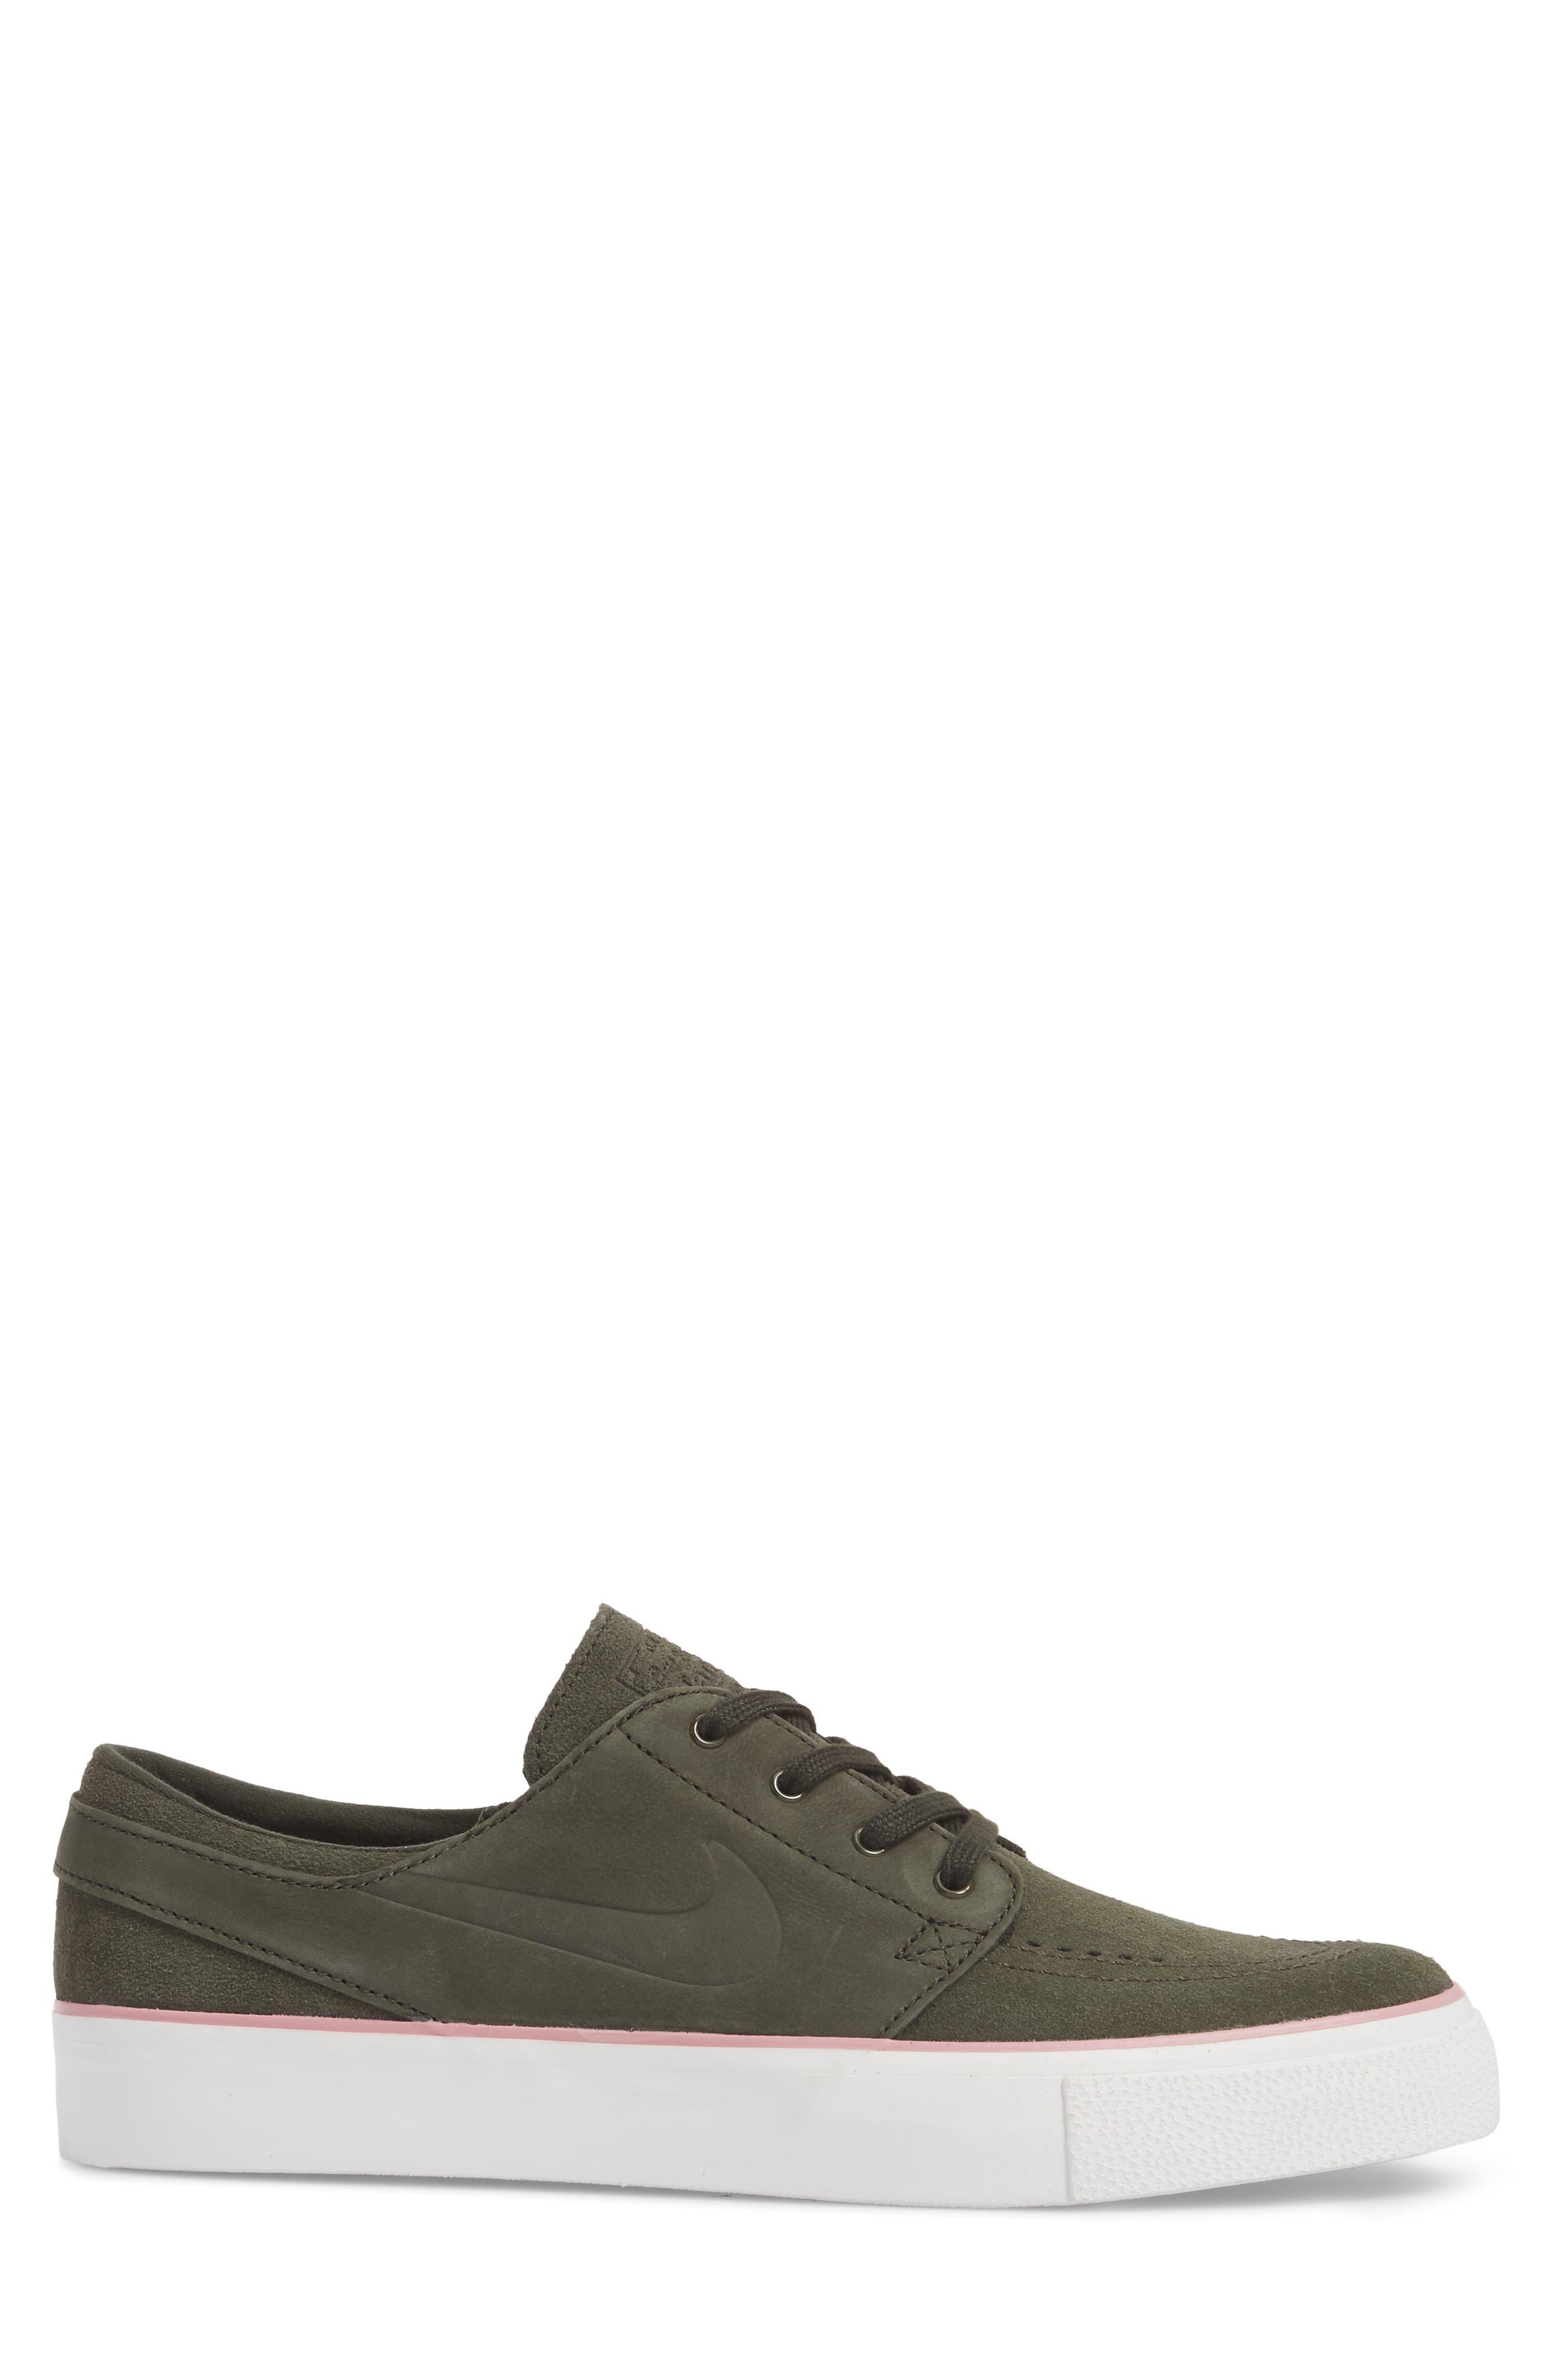 Zoom - Stefan Janoski SB Low Top Sneaker,                             Alternate thumbnail 3, color,                             300